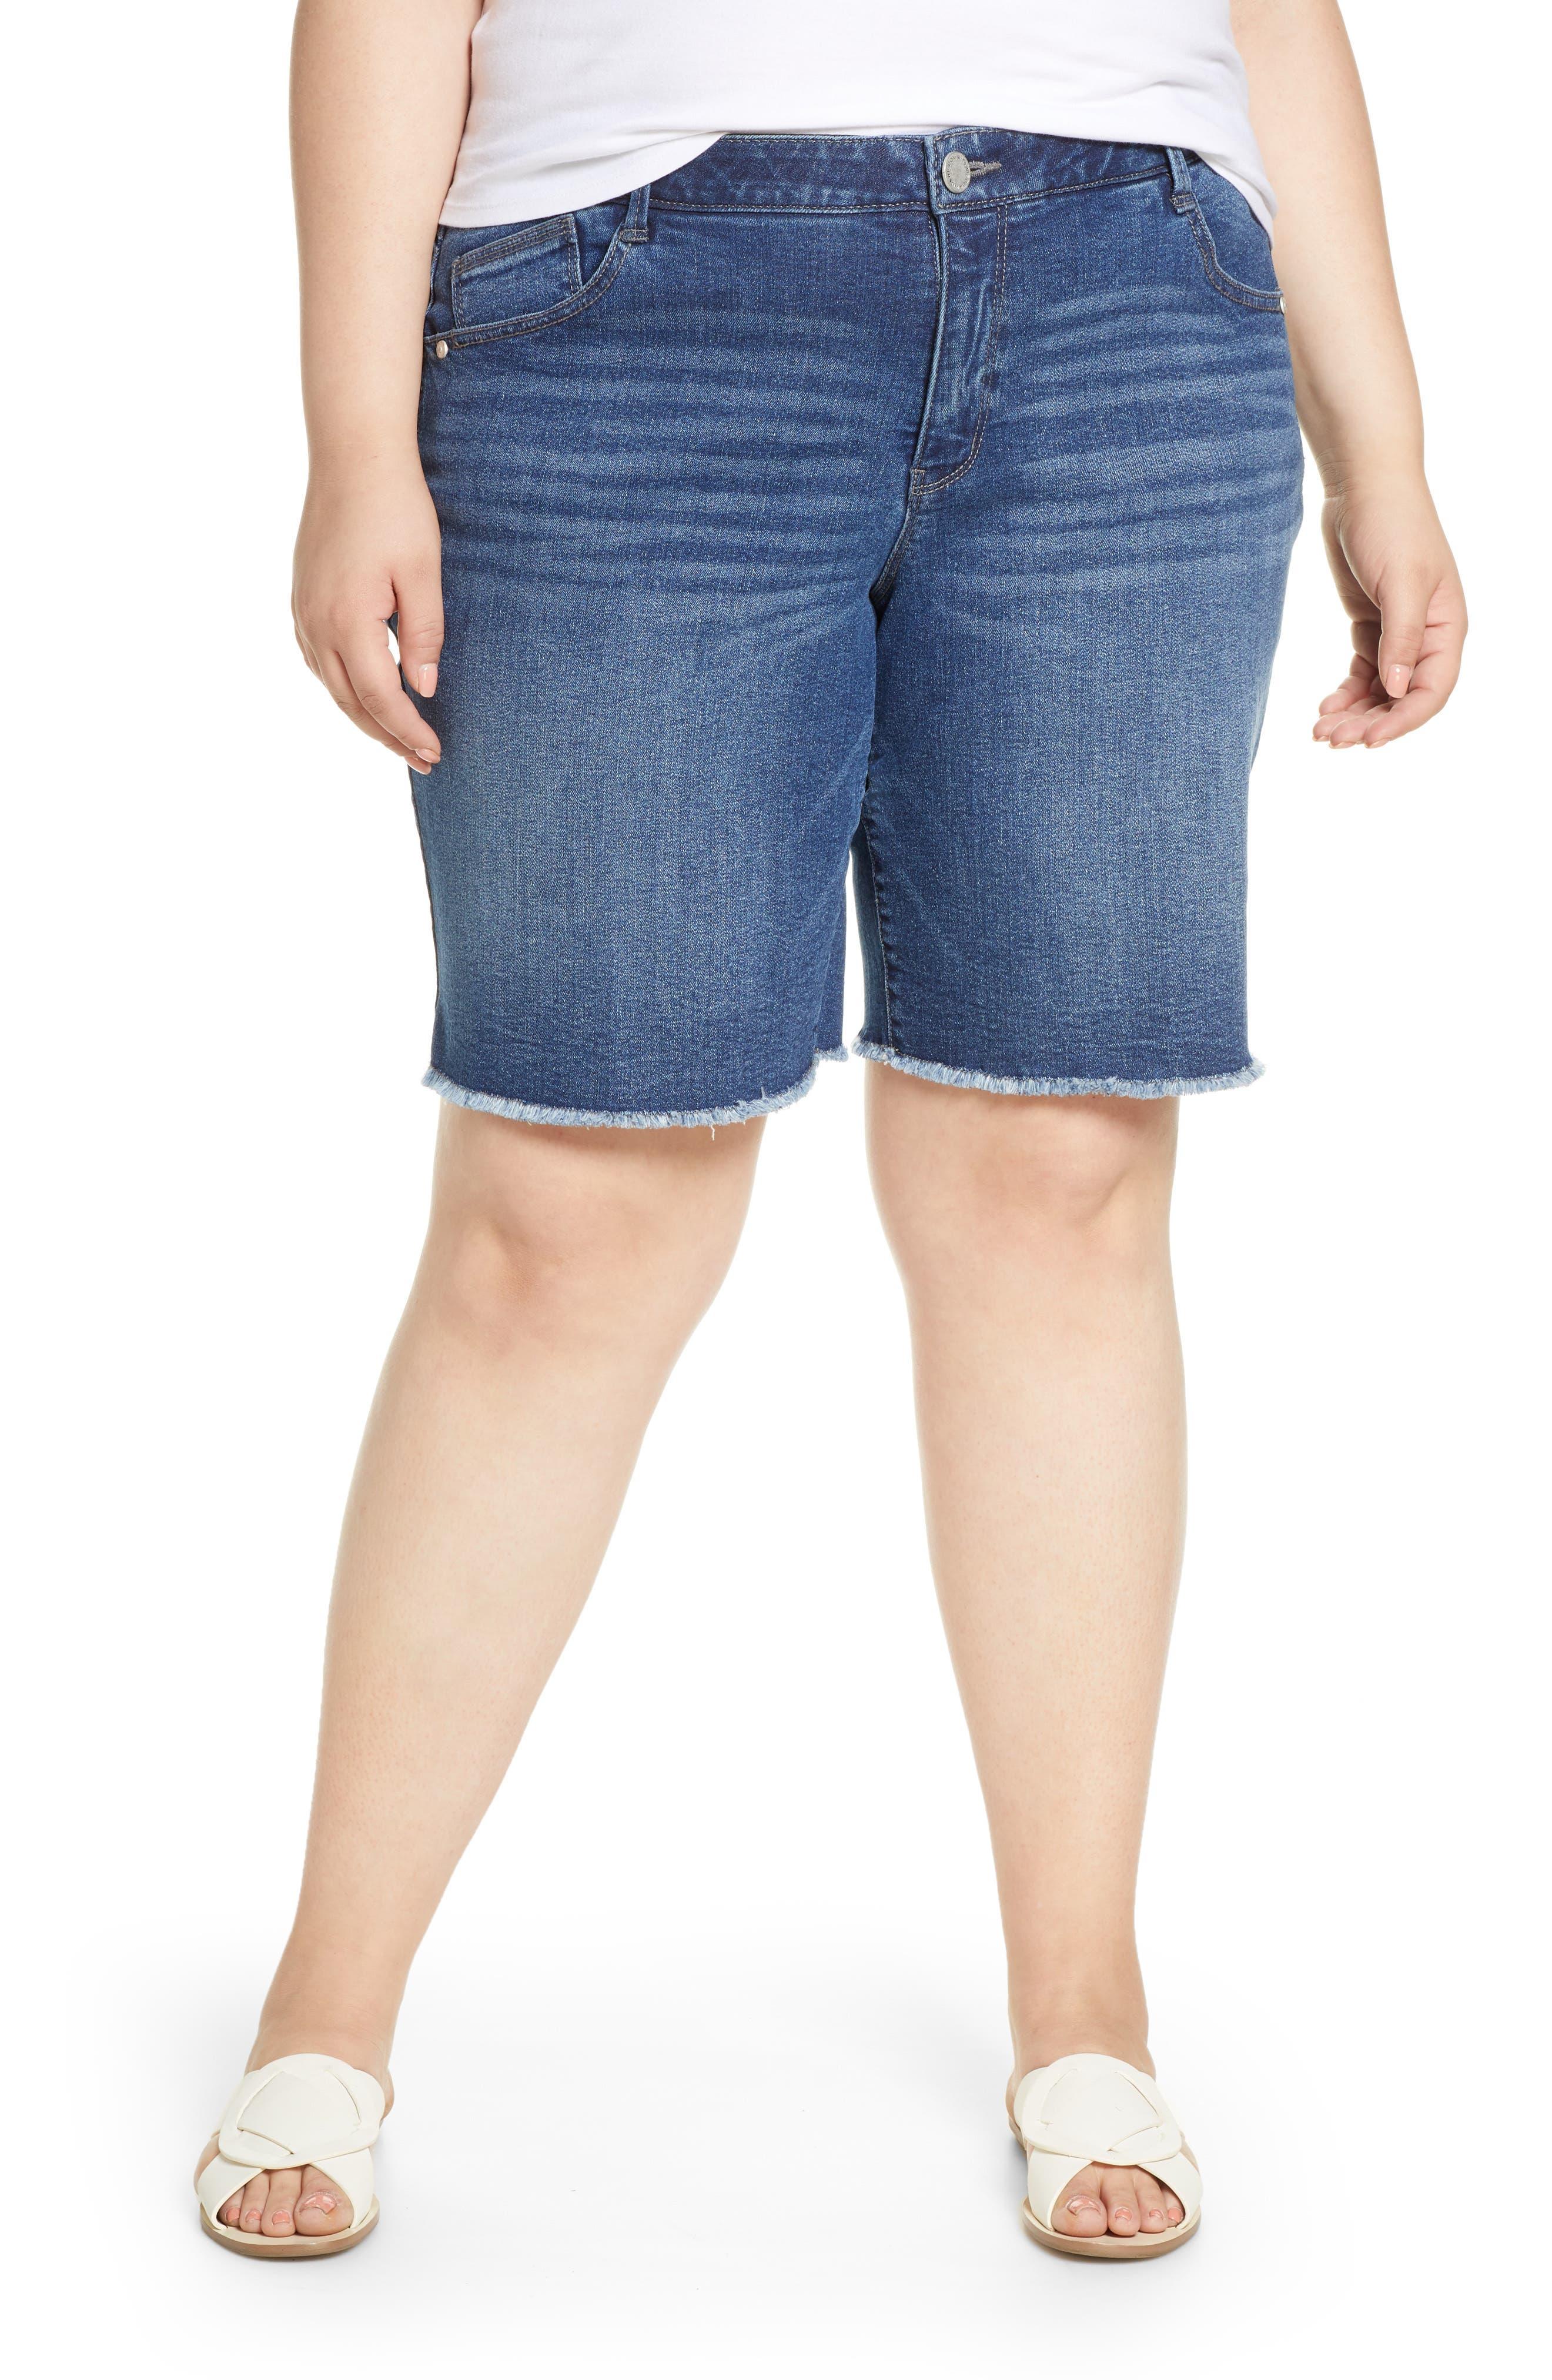 Plus Women's Wit & wisdom Ab-Solution Retro Denim Bermuda Shorts